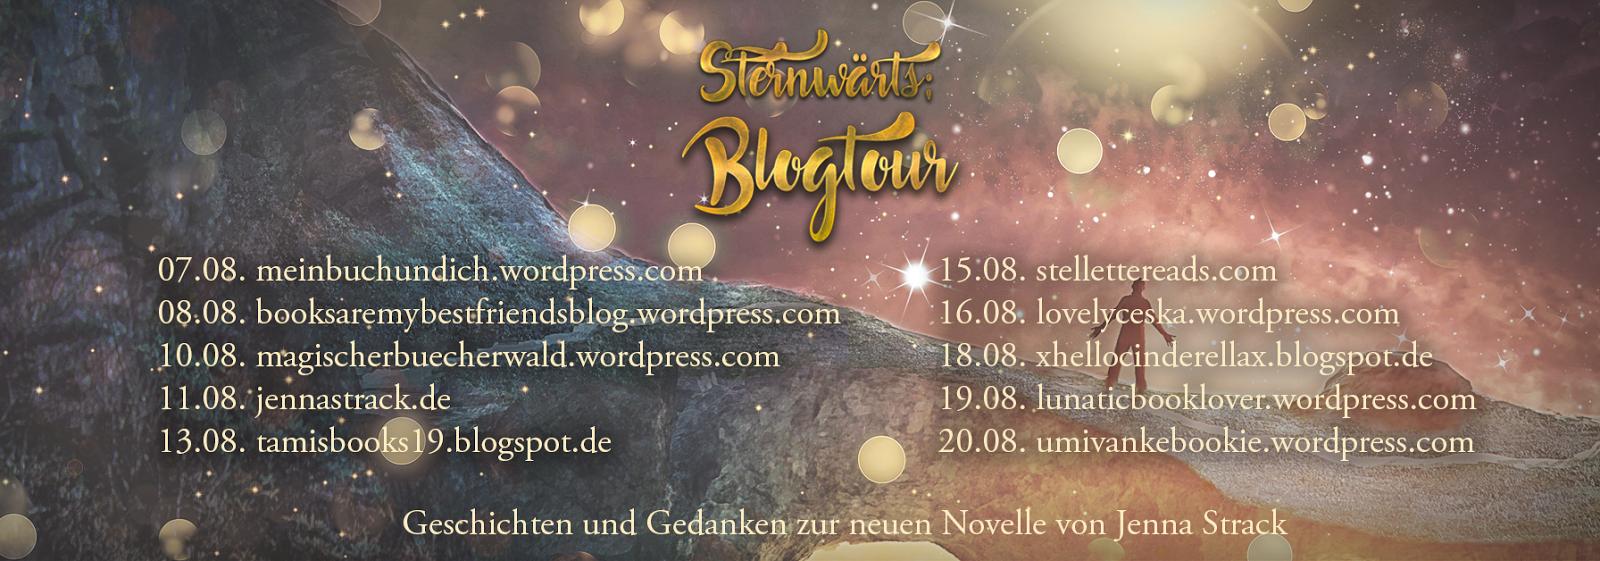 Blogtour - Sternwärts